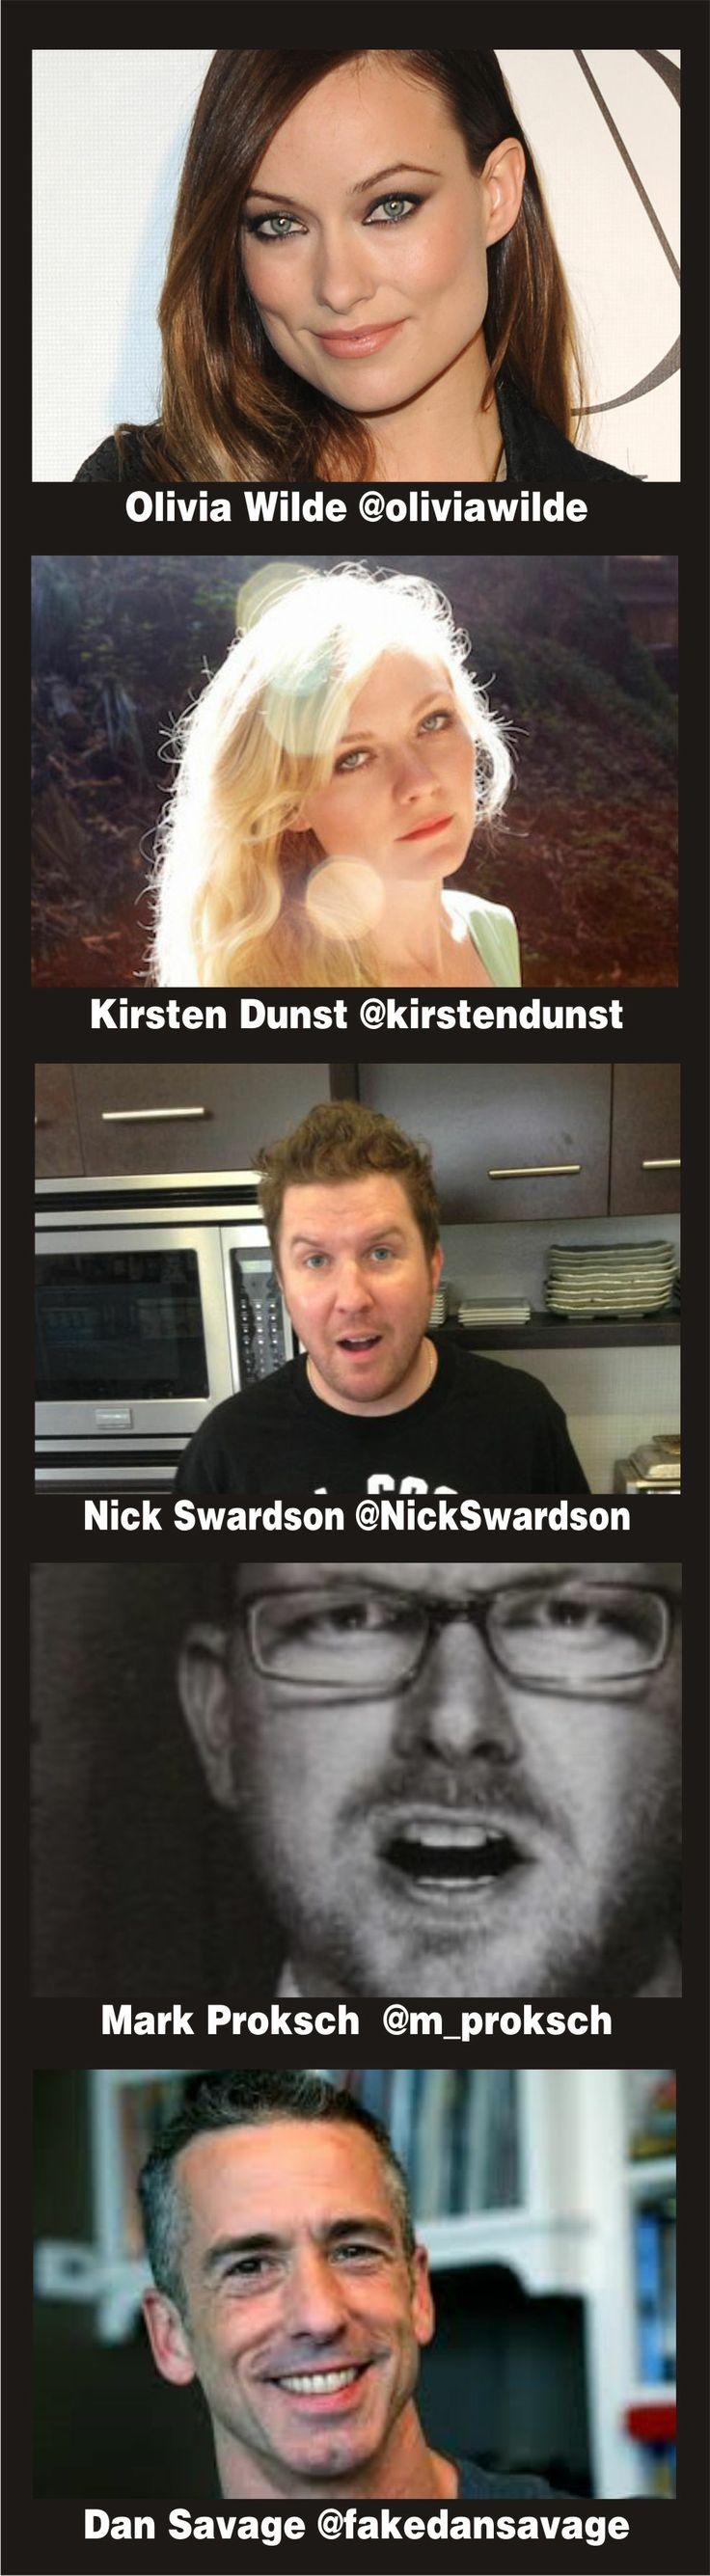 Guest Stars for #PORTLANDIA Season 4:  Olivia Wilde @Pure Beauty Kirsten Dunst @Kirsten Dunst Nick Swardson @NickSwardson  Mark Proksch  @m_proksch Dan Savage @fakedansavage